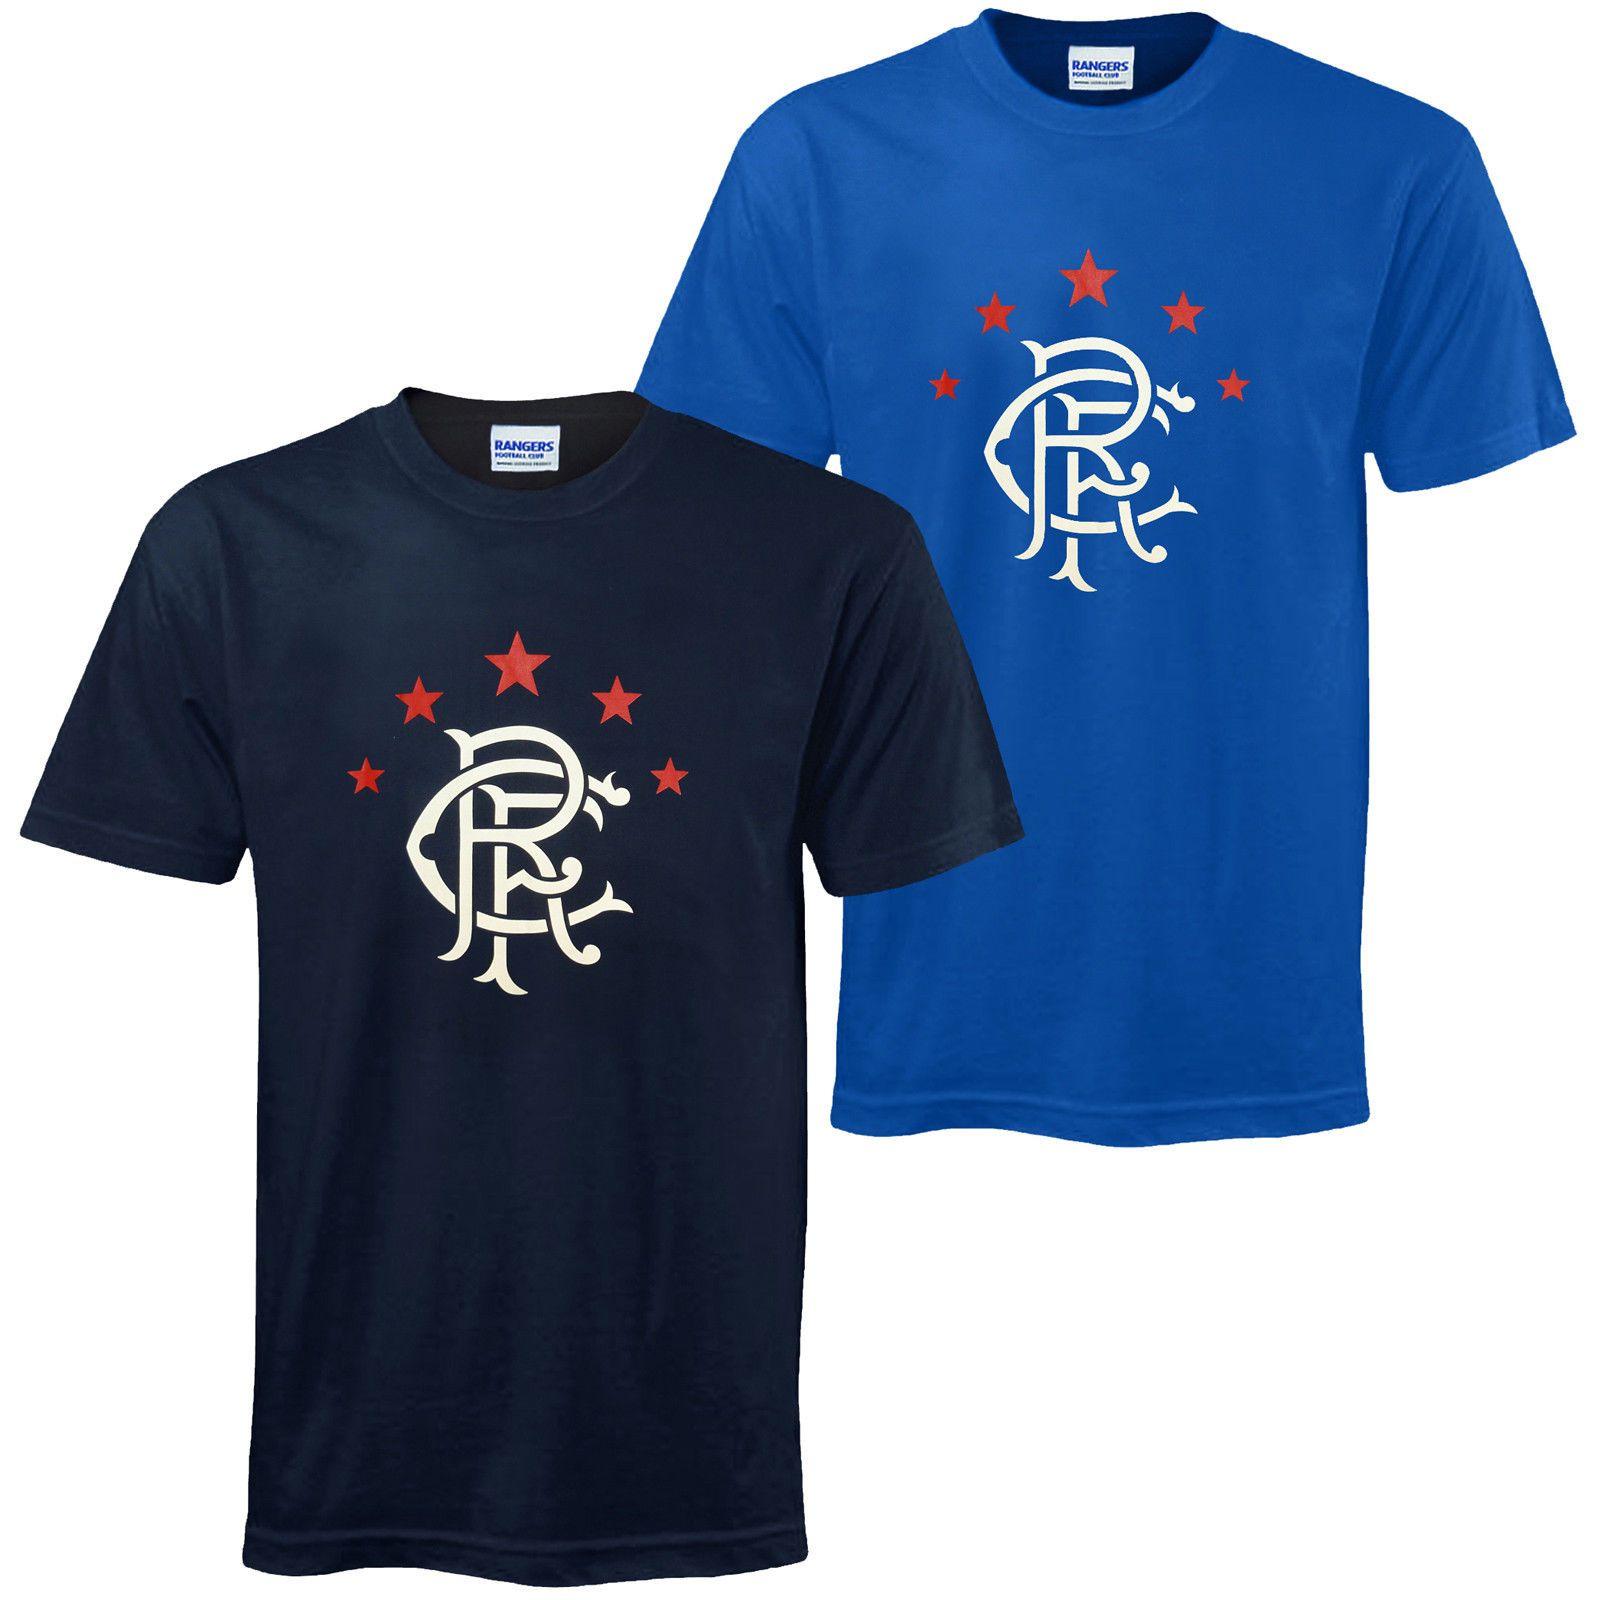 223009f0c29 Rangers FC Official Football Gift Mens Crest T Shirt Funny Unisex ...